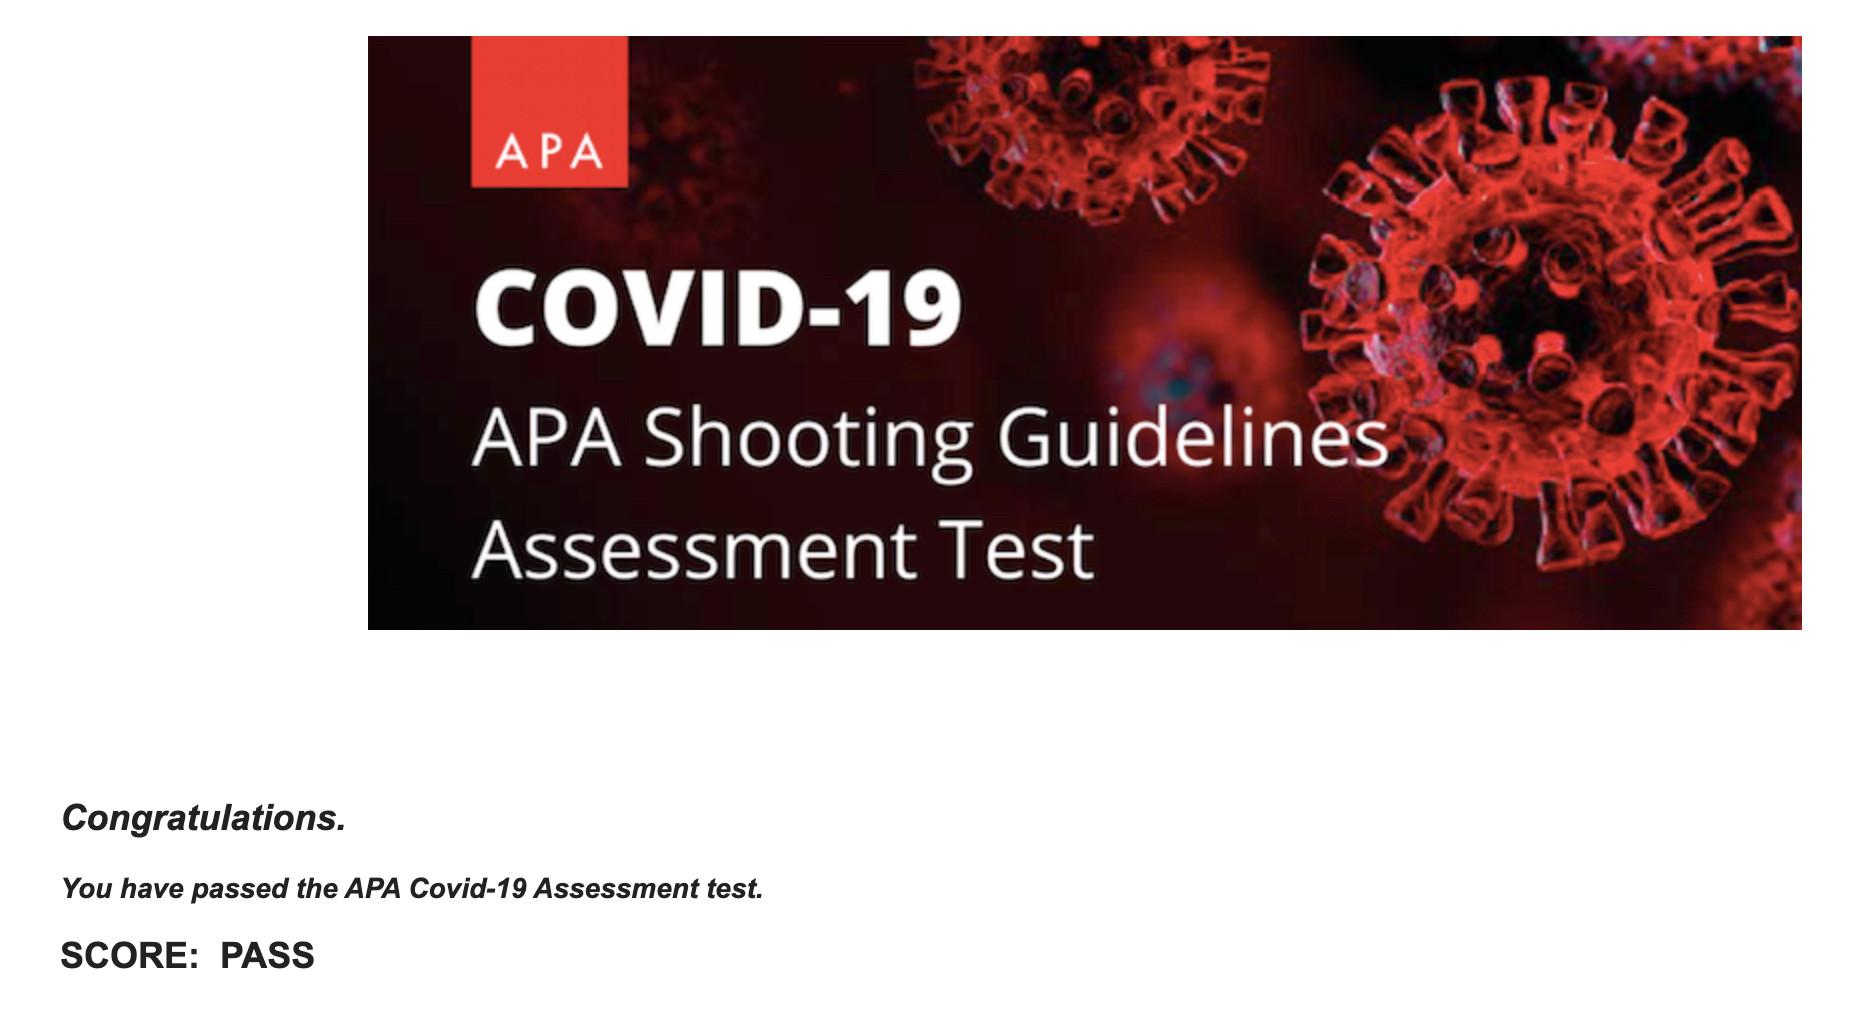 APA Covid-19